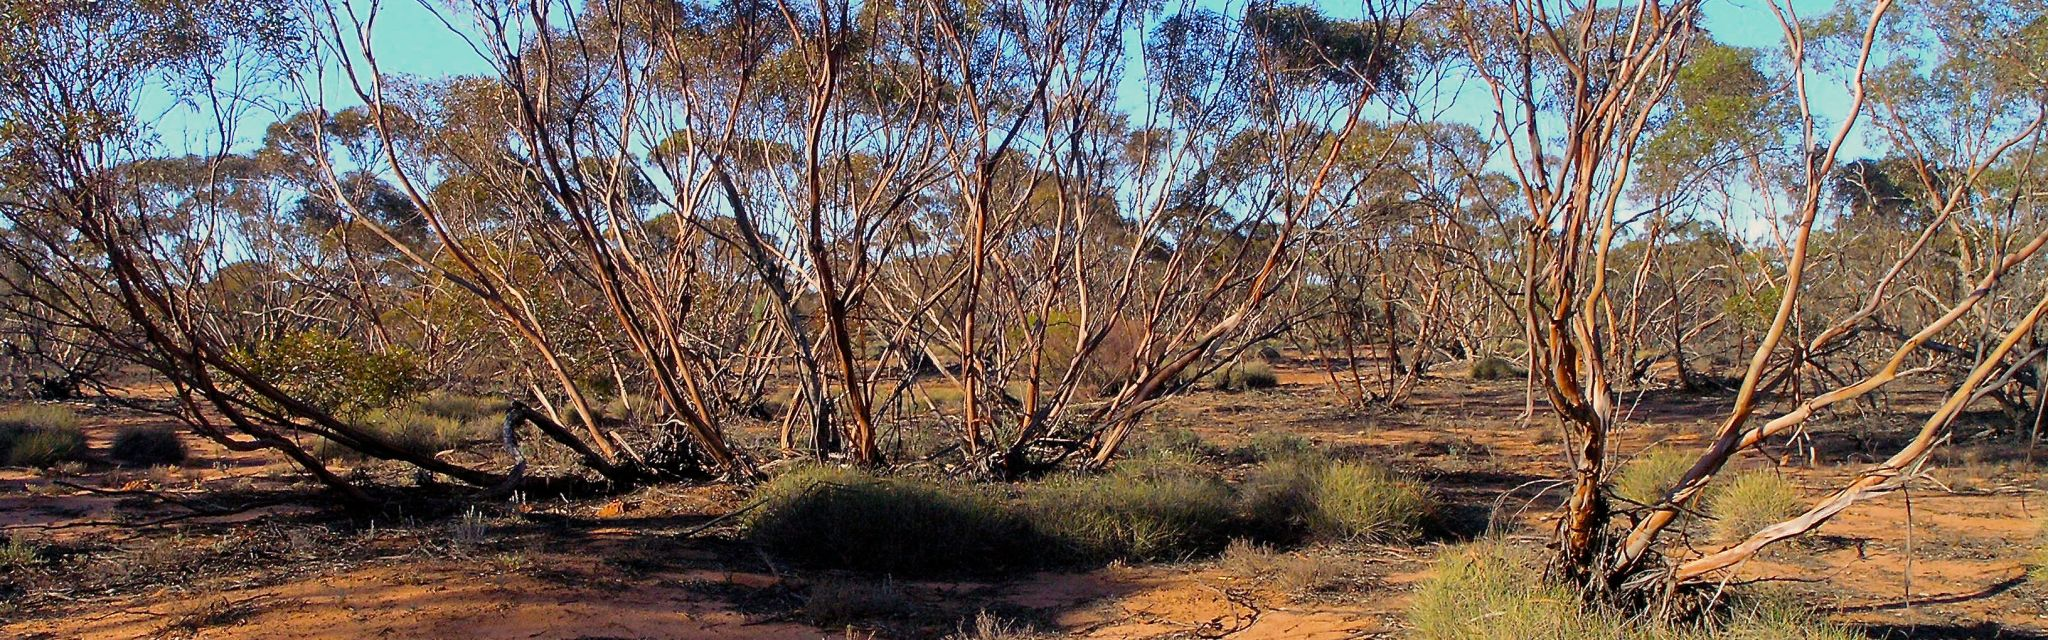 Mallee Scrub Mungo National park Big Rivers Outback Tour